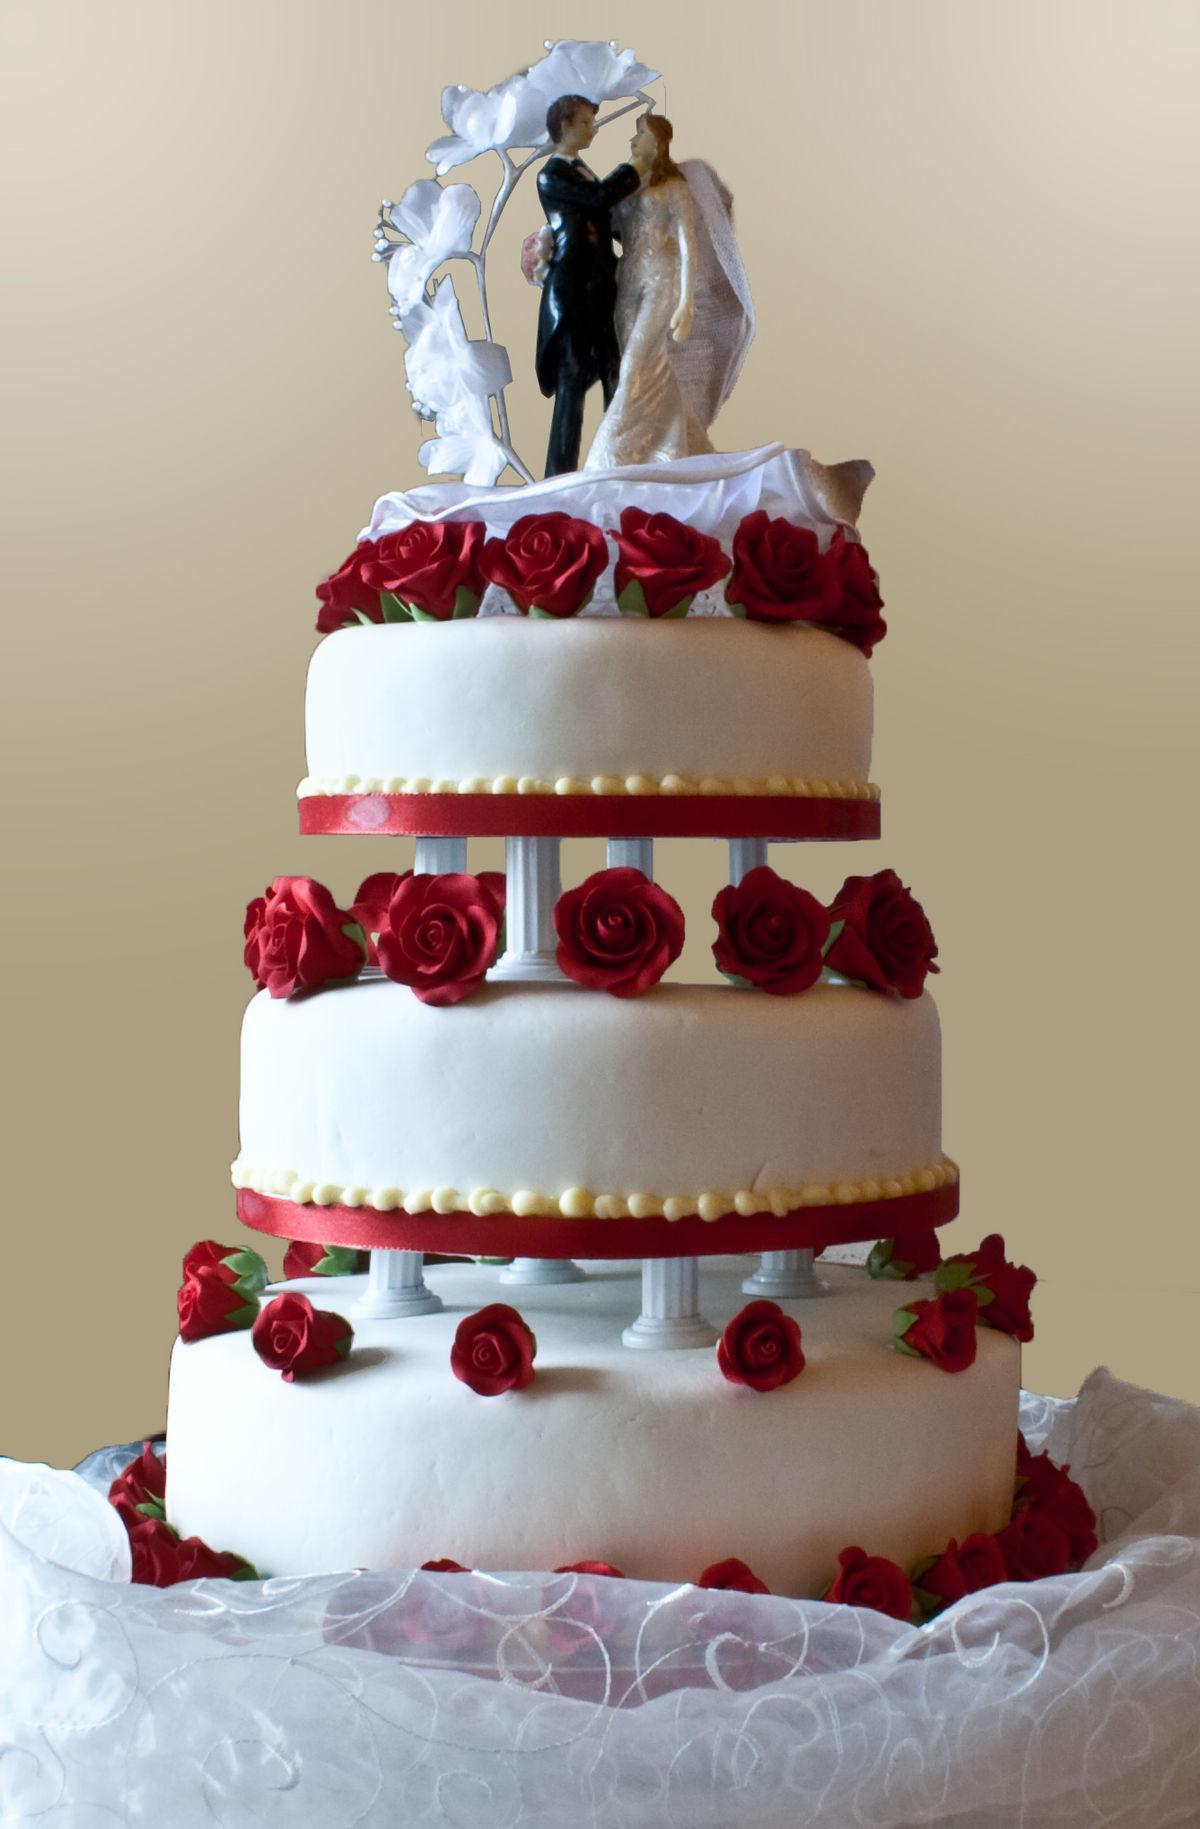 Best Christmas Cakes 2019  Wedding cake